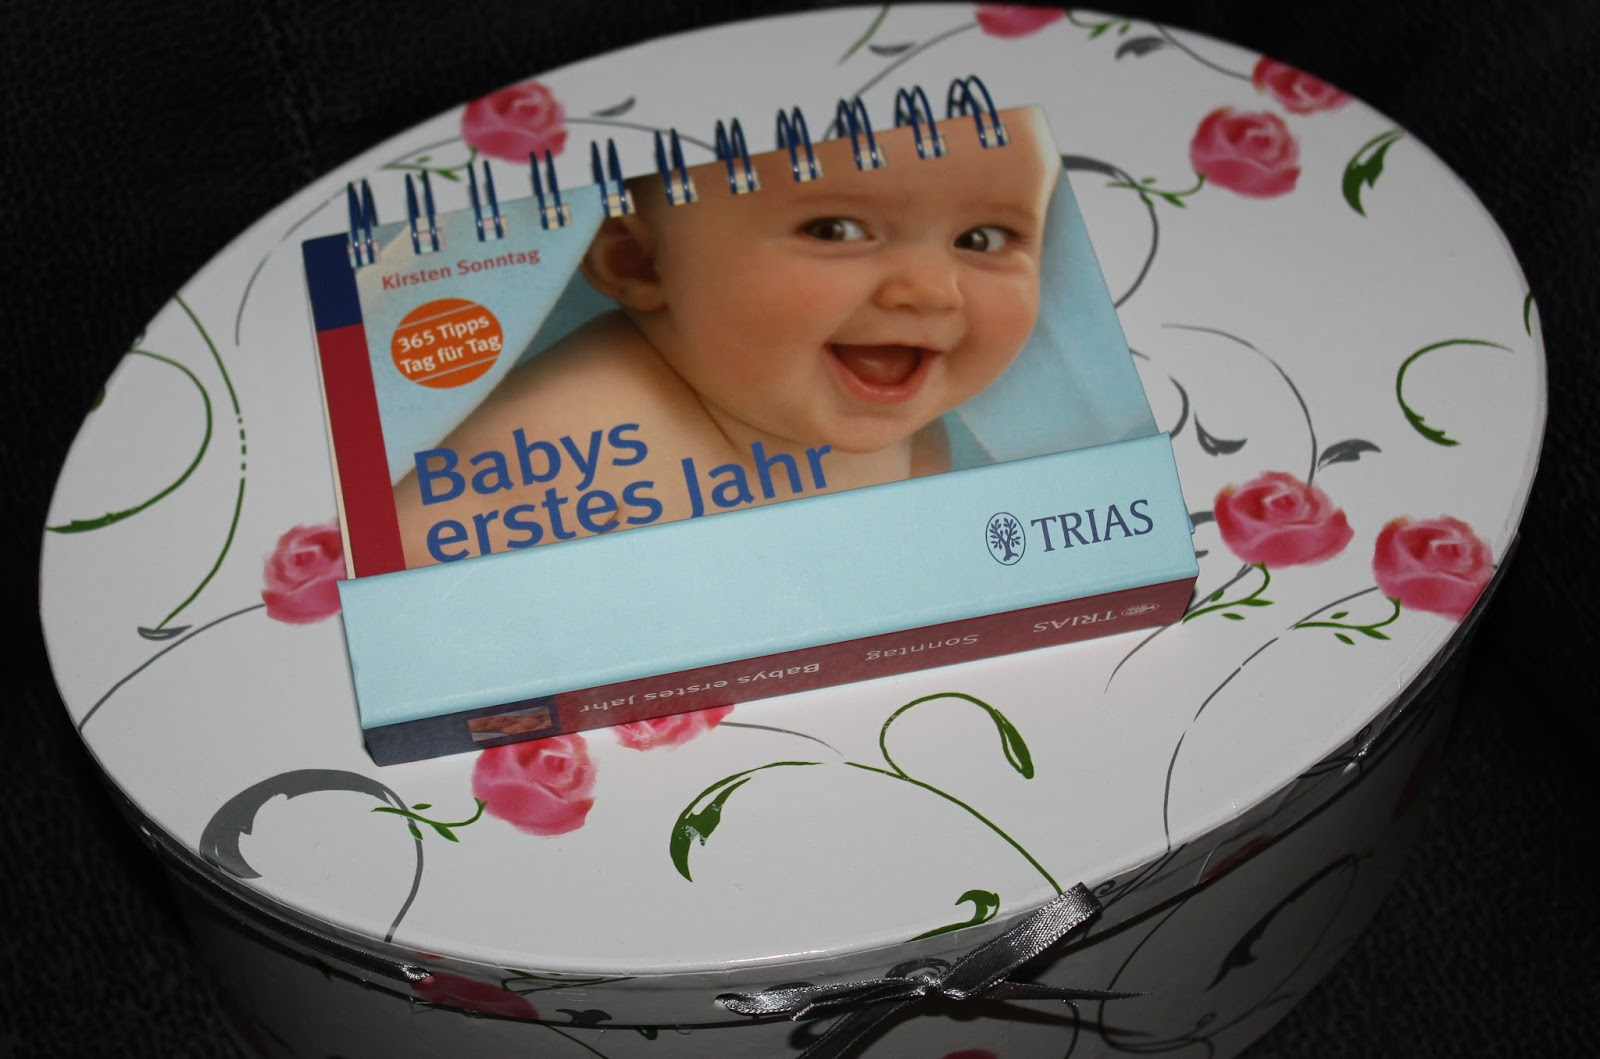 babys erstes jahr 365 tipps tag fr tag